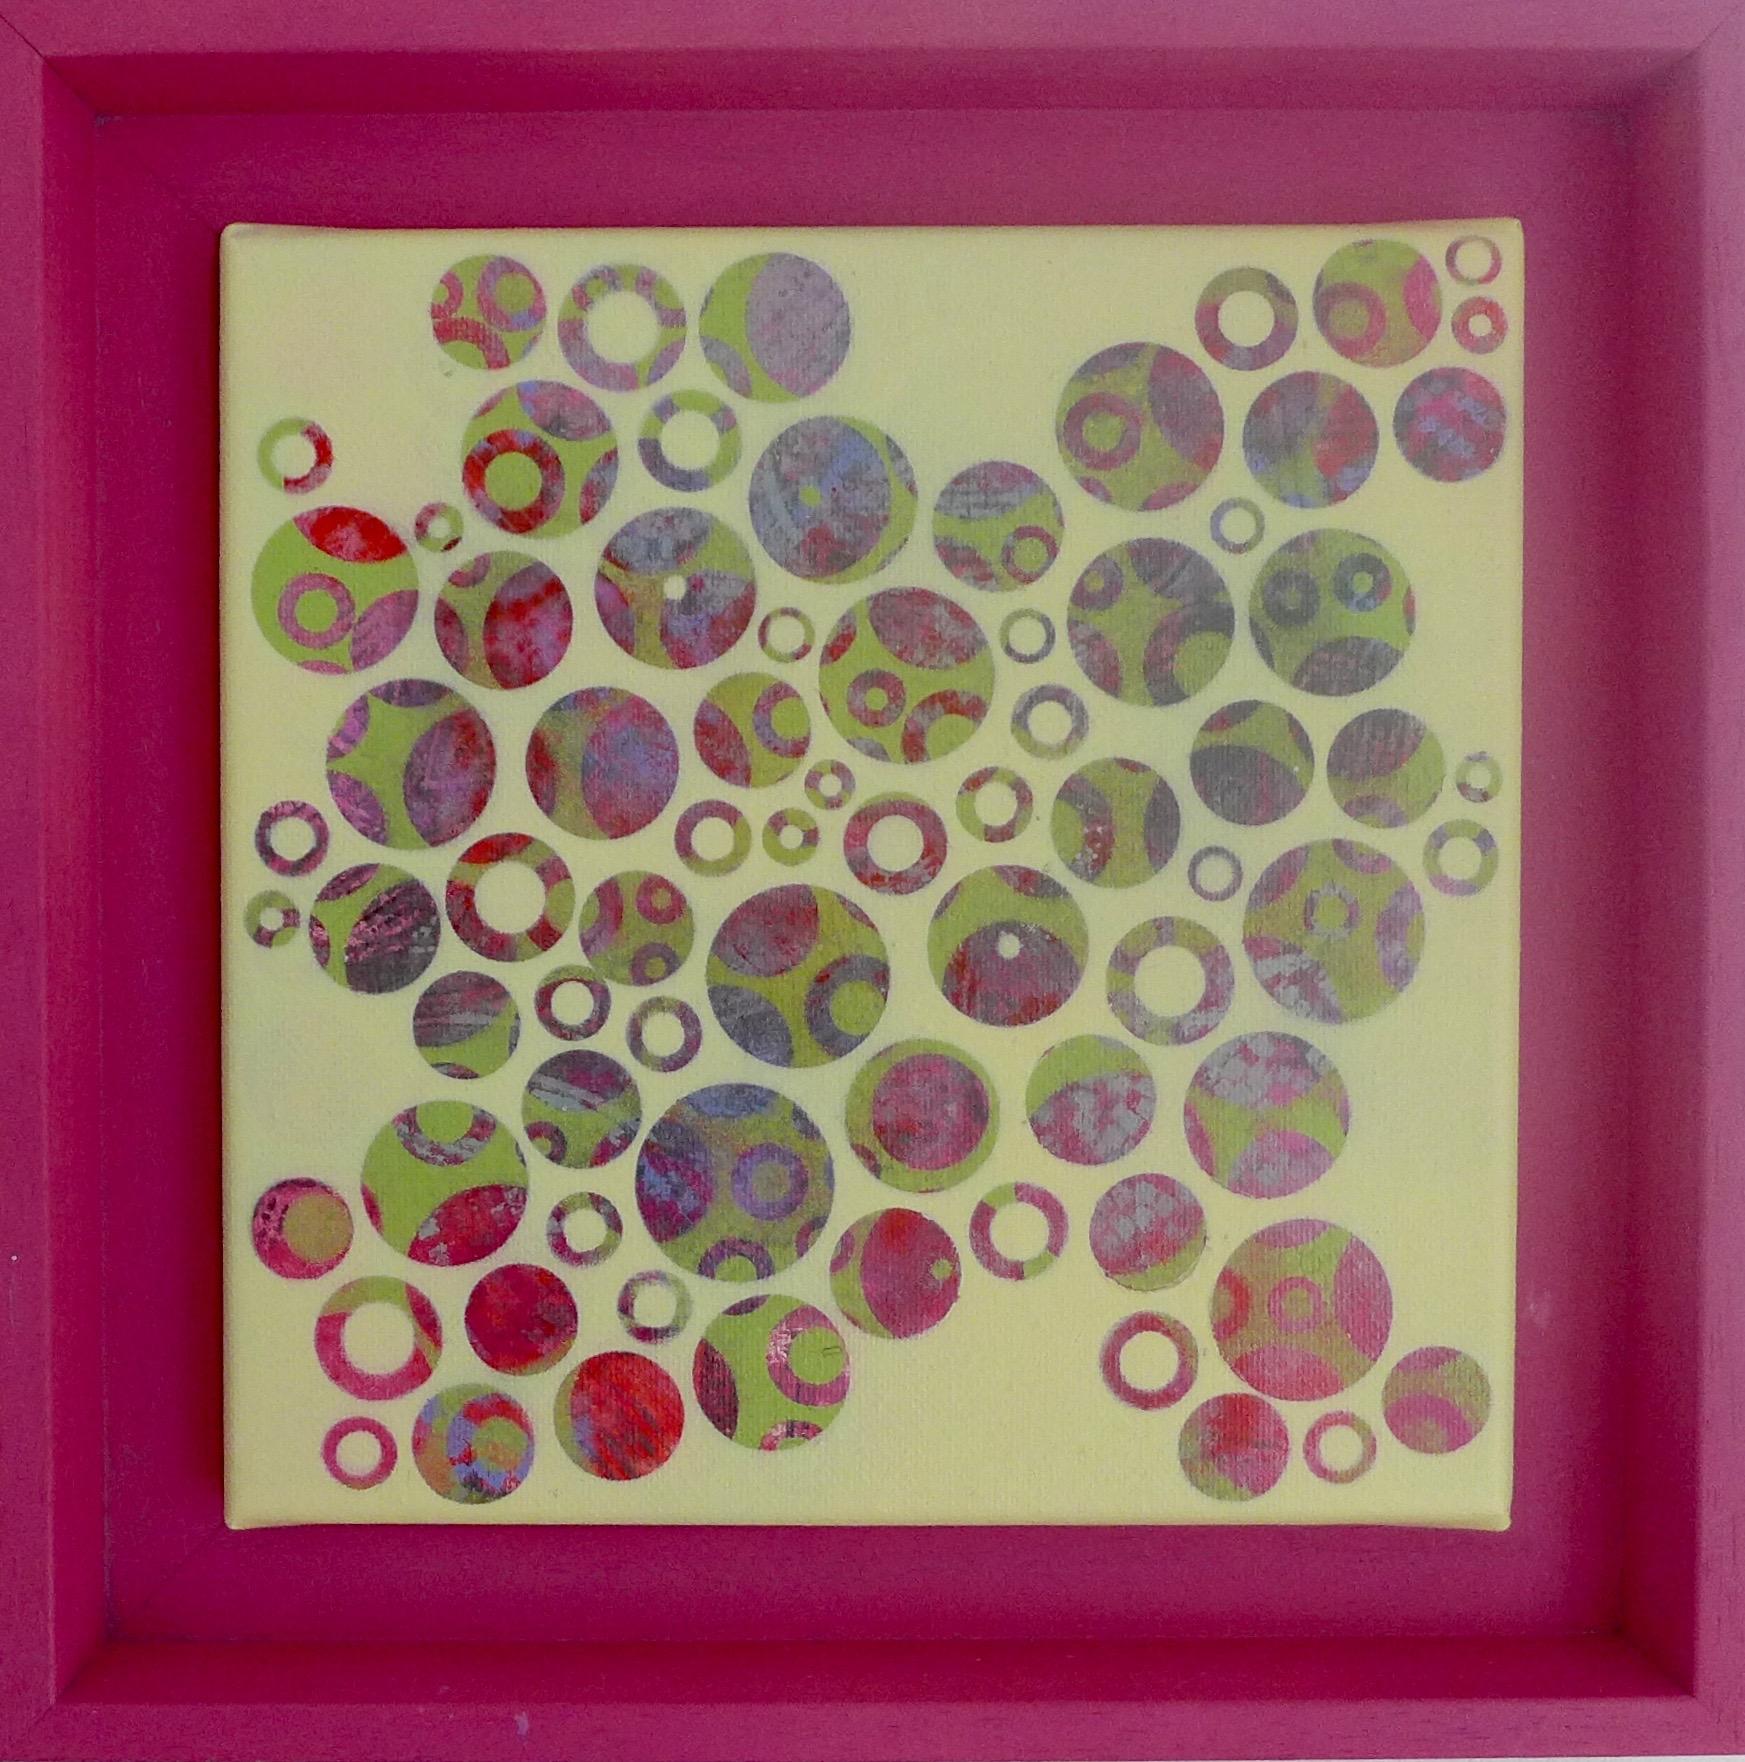 'Dots 11' painting by Nicki MacRae